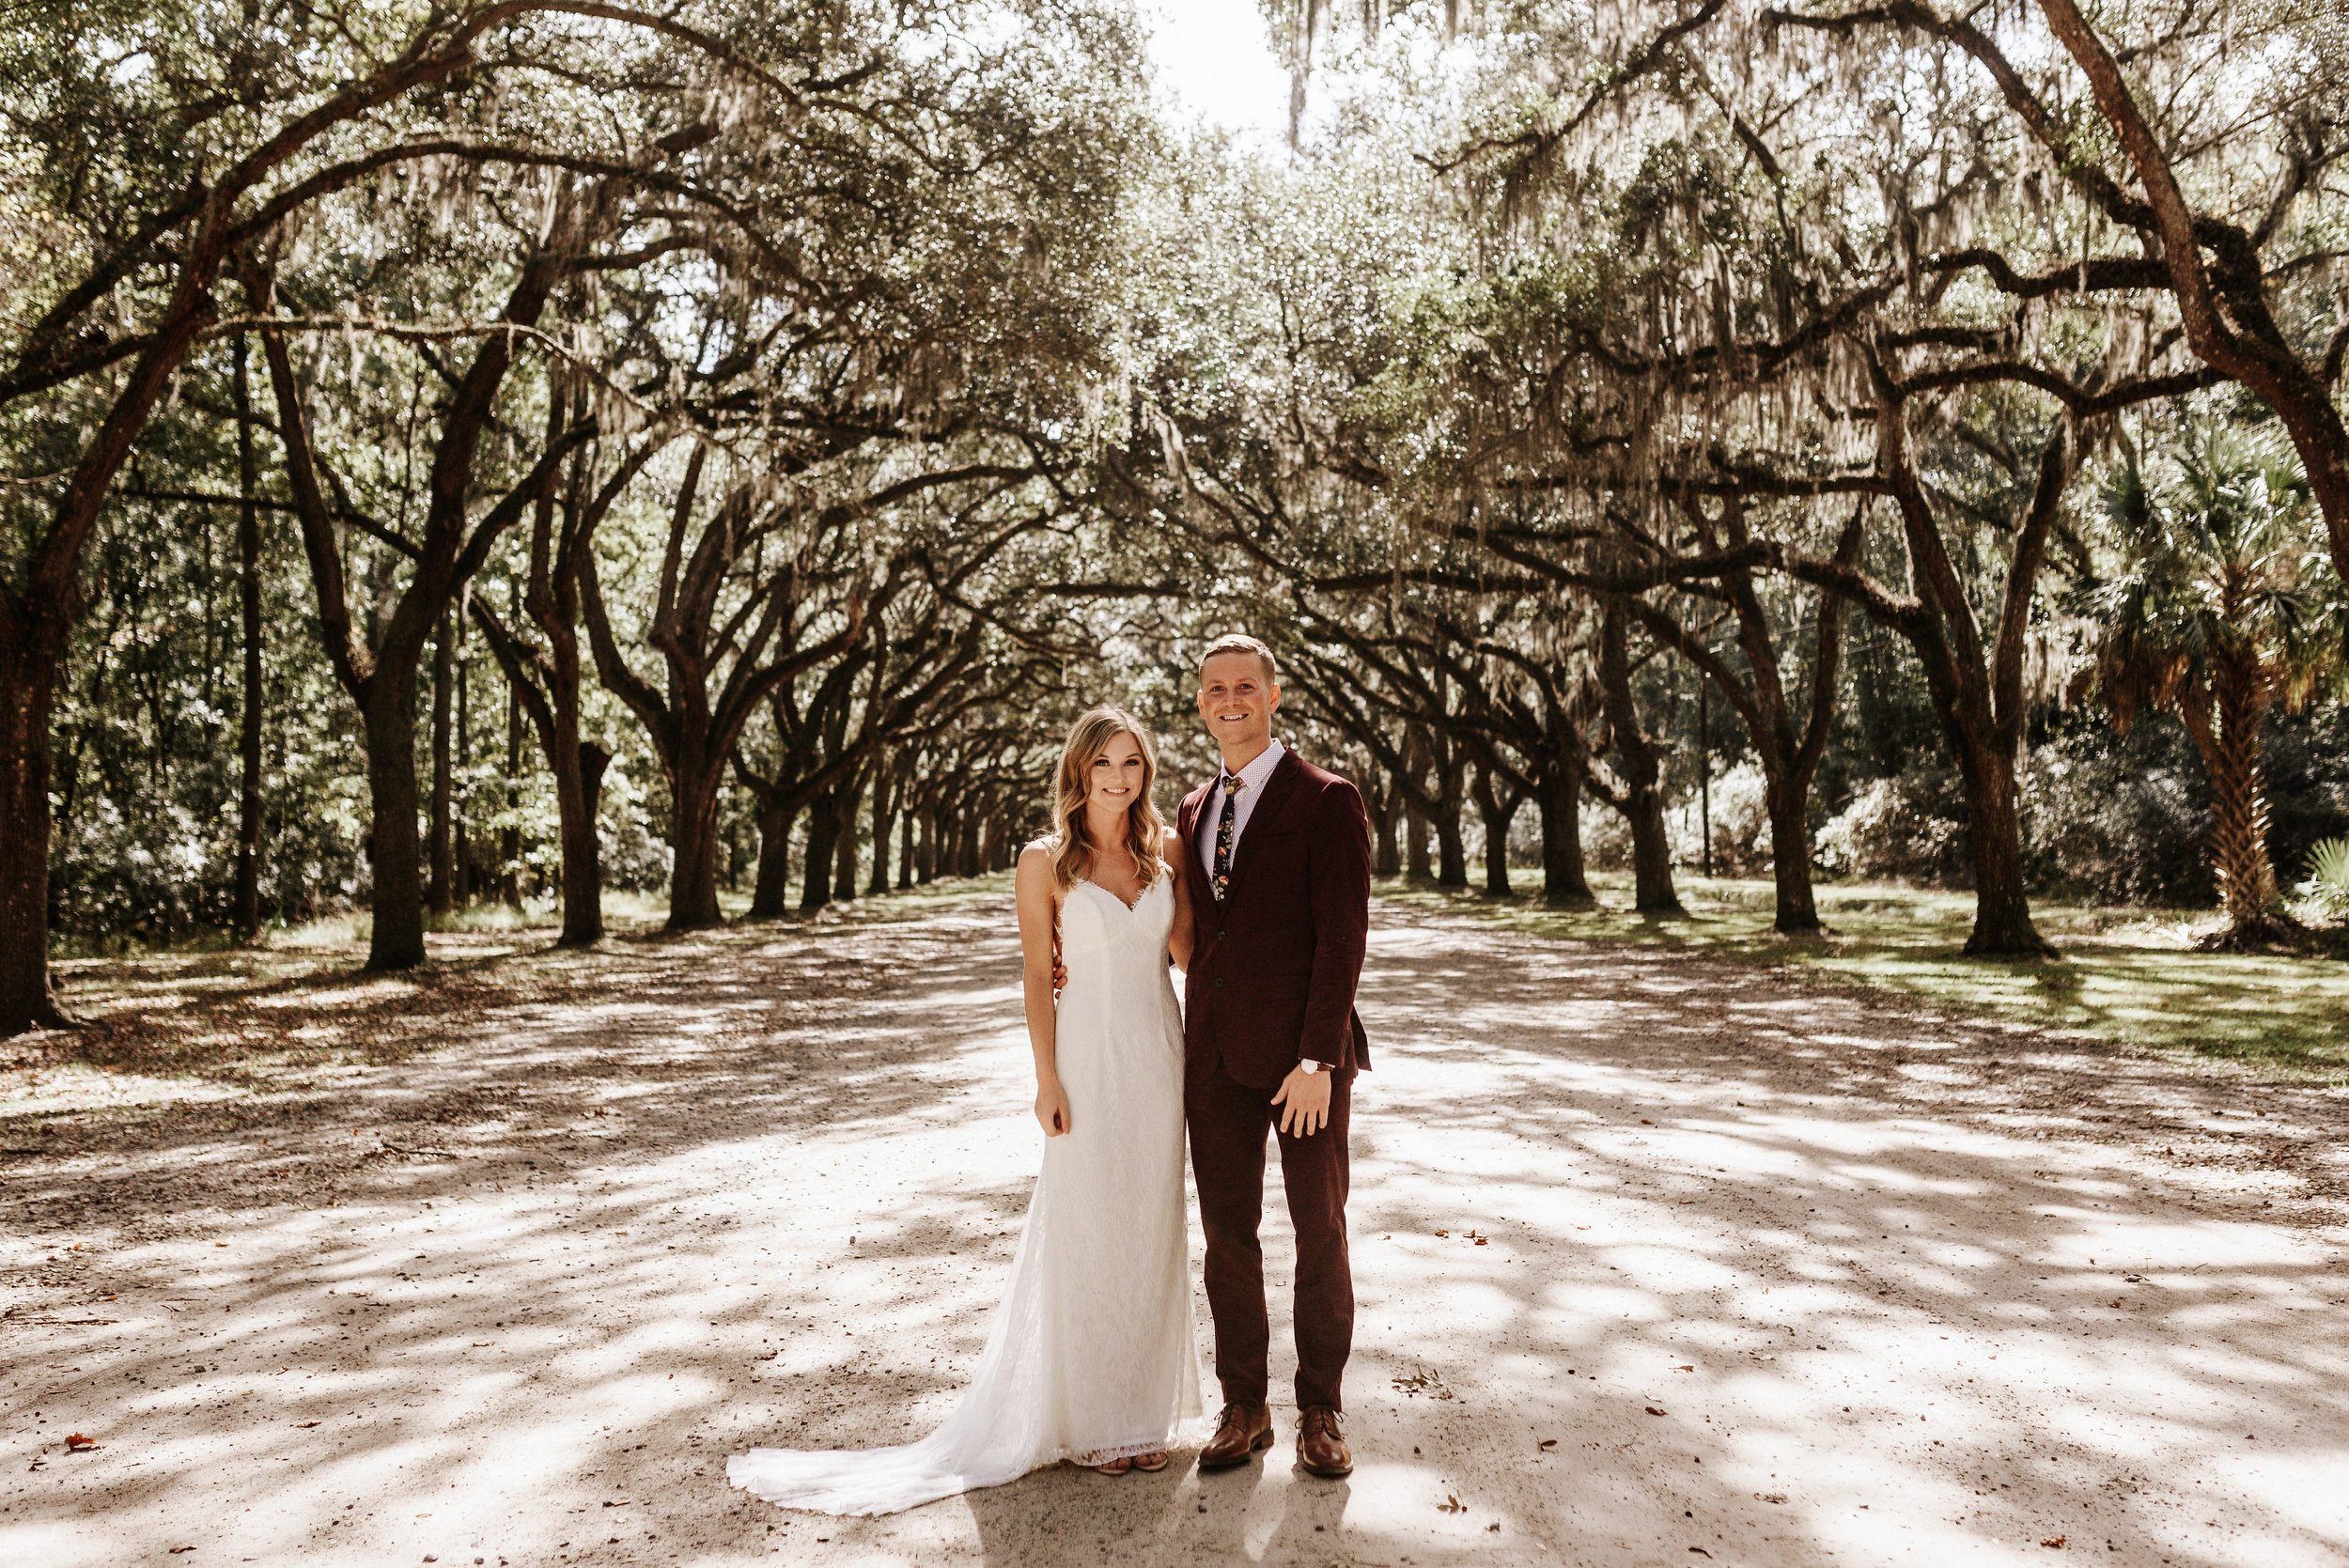 Kourtney_Sean_Savannah_Georgia_Wedding_Wormsloe_Histroic_Site_Coastal_Georgia_Botanical_Gardens_Photography_by_V_3644.jpg